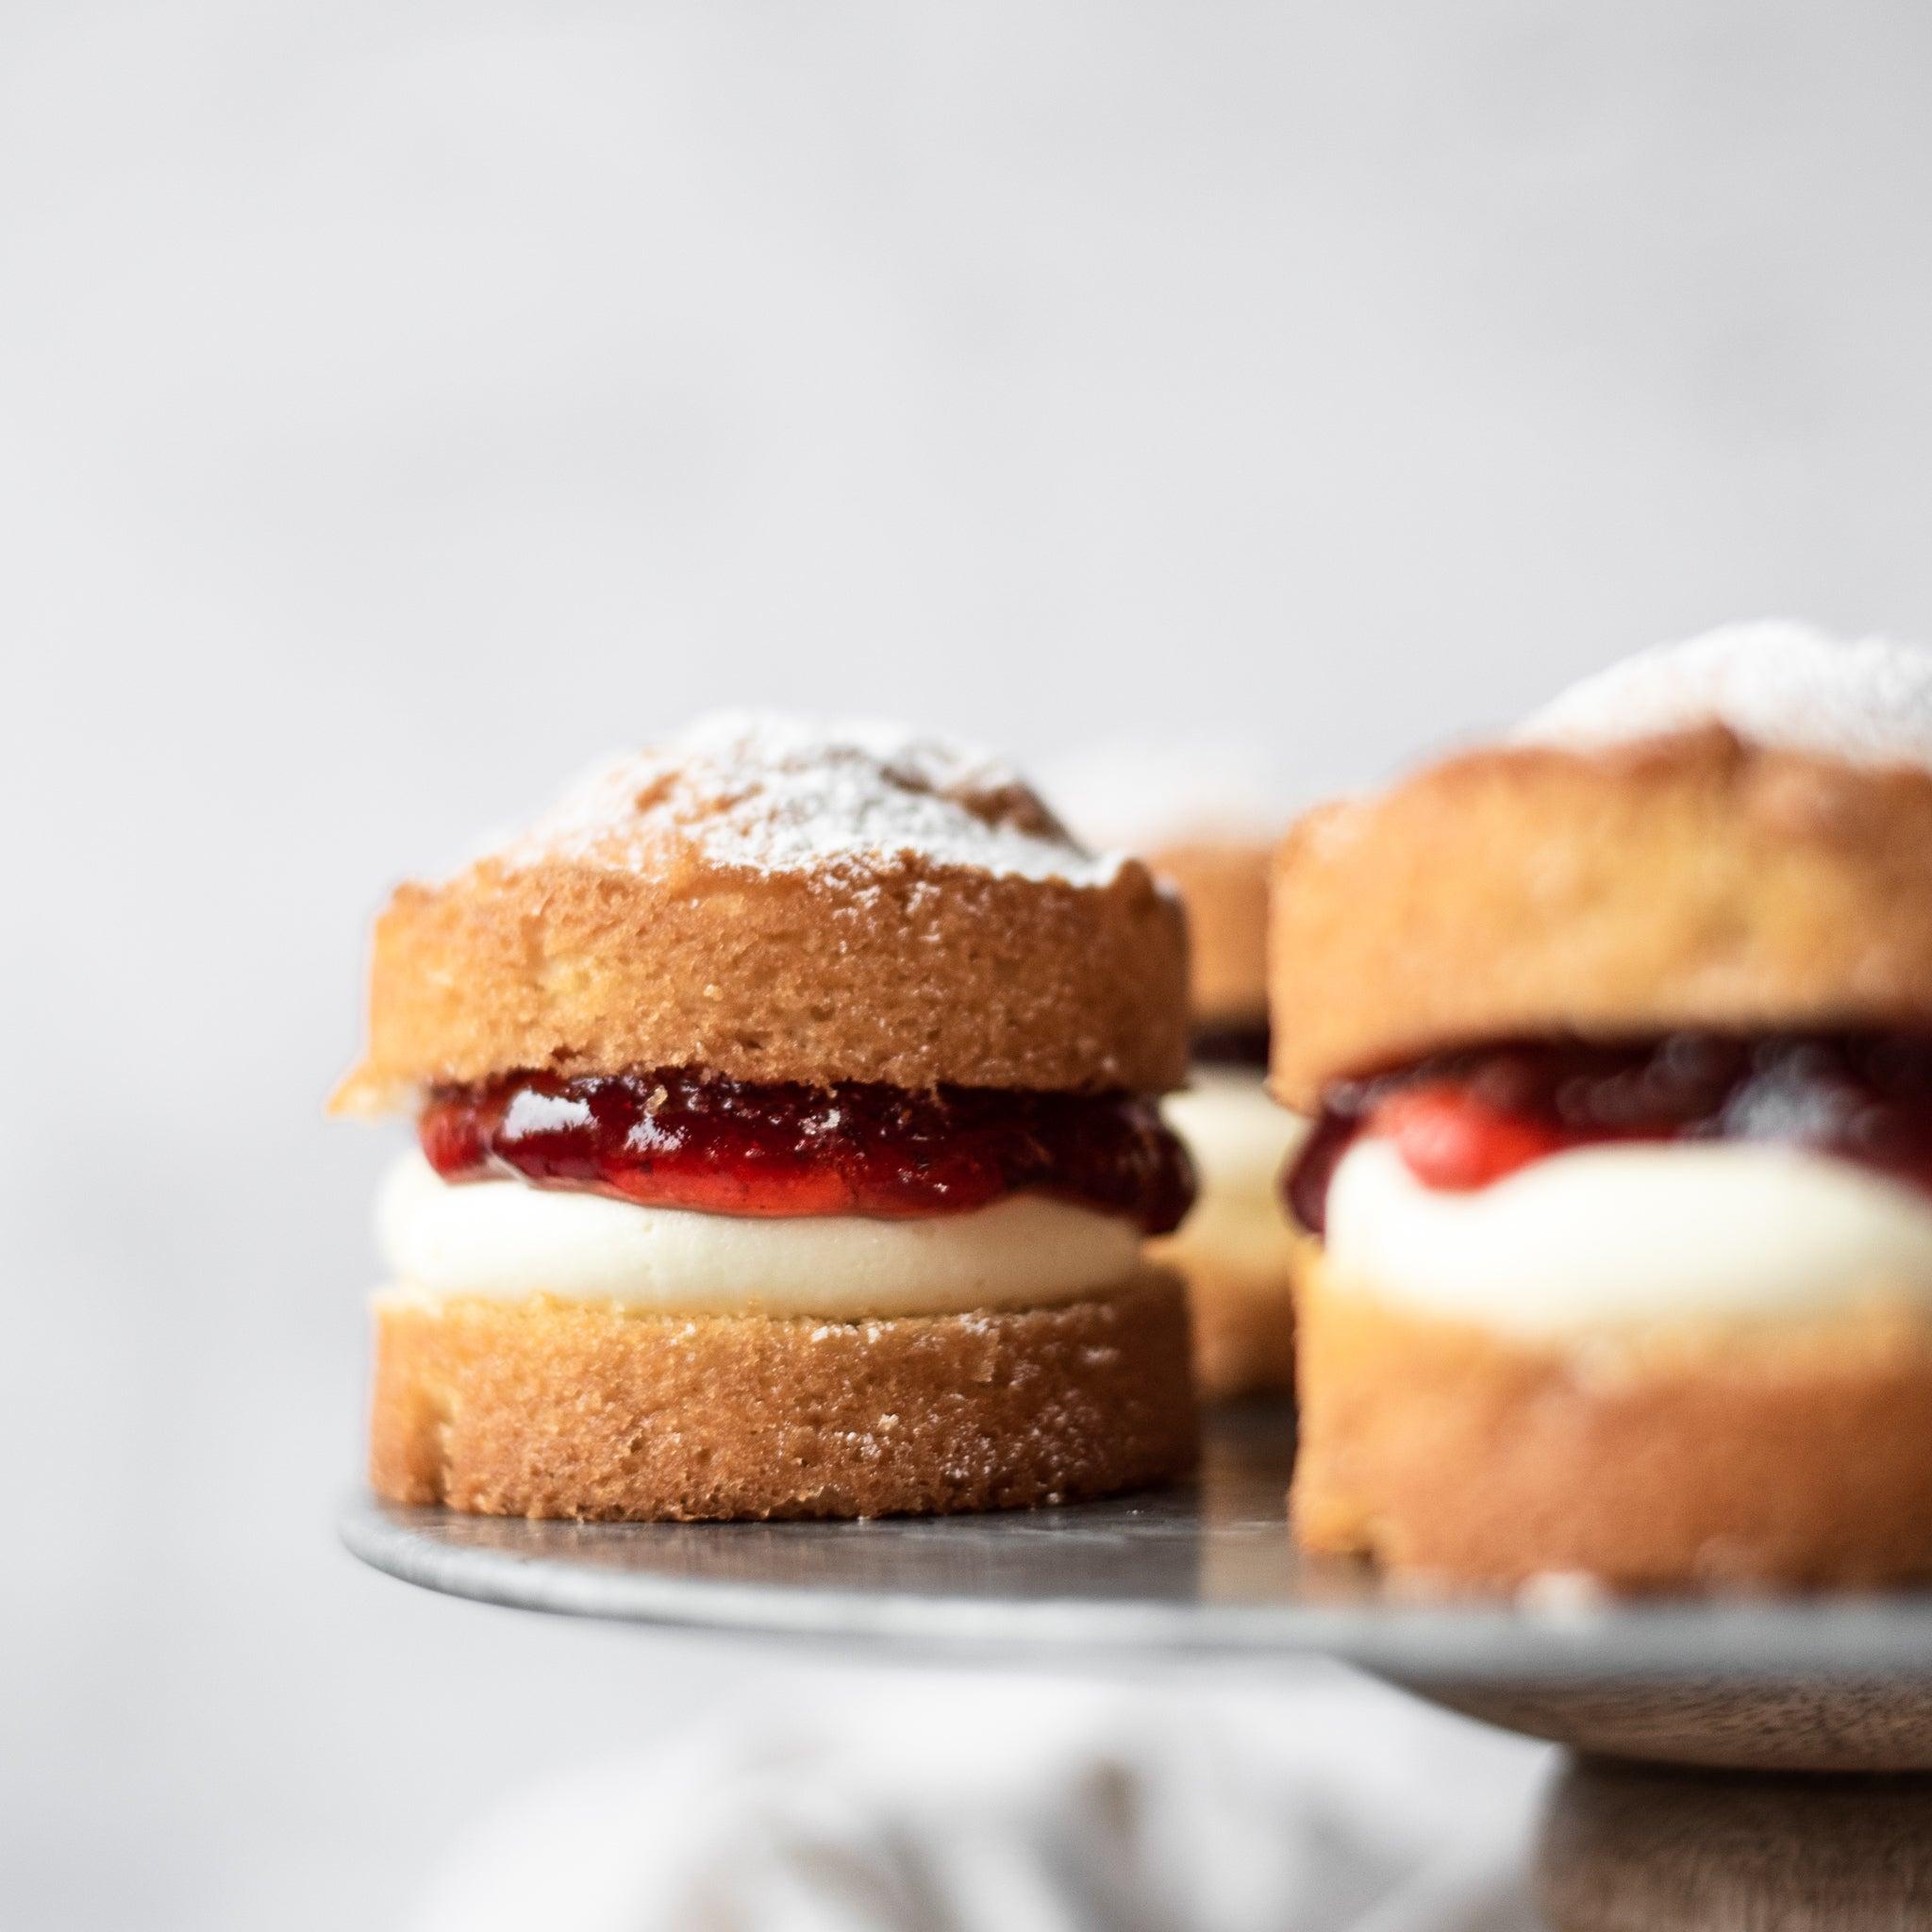 Strawberry-and-Rosewater-Mini-Sponge-Cakes-SQUARE-2.jpg